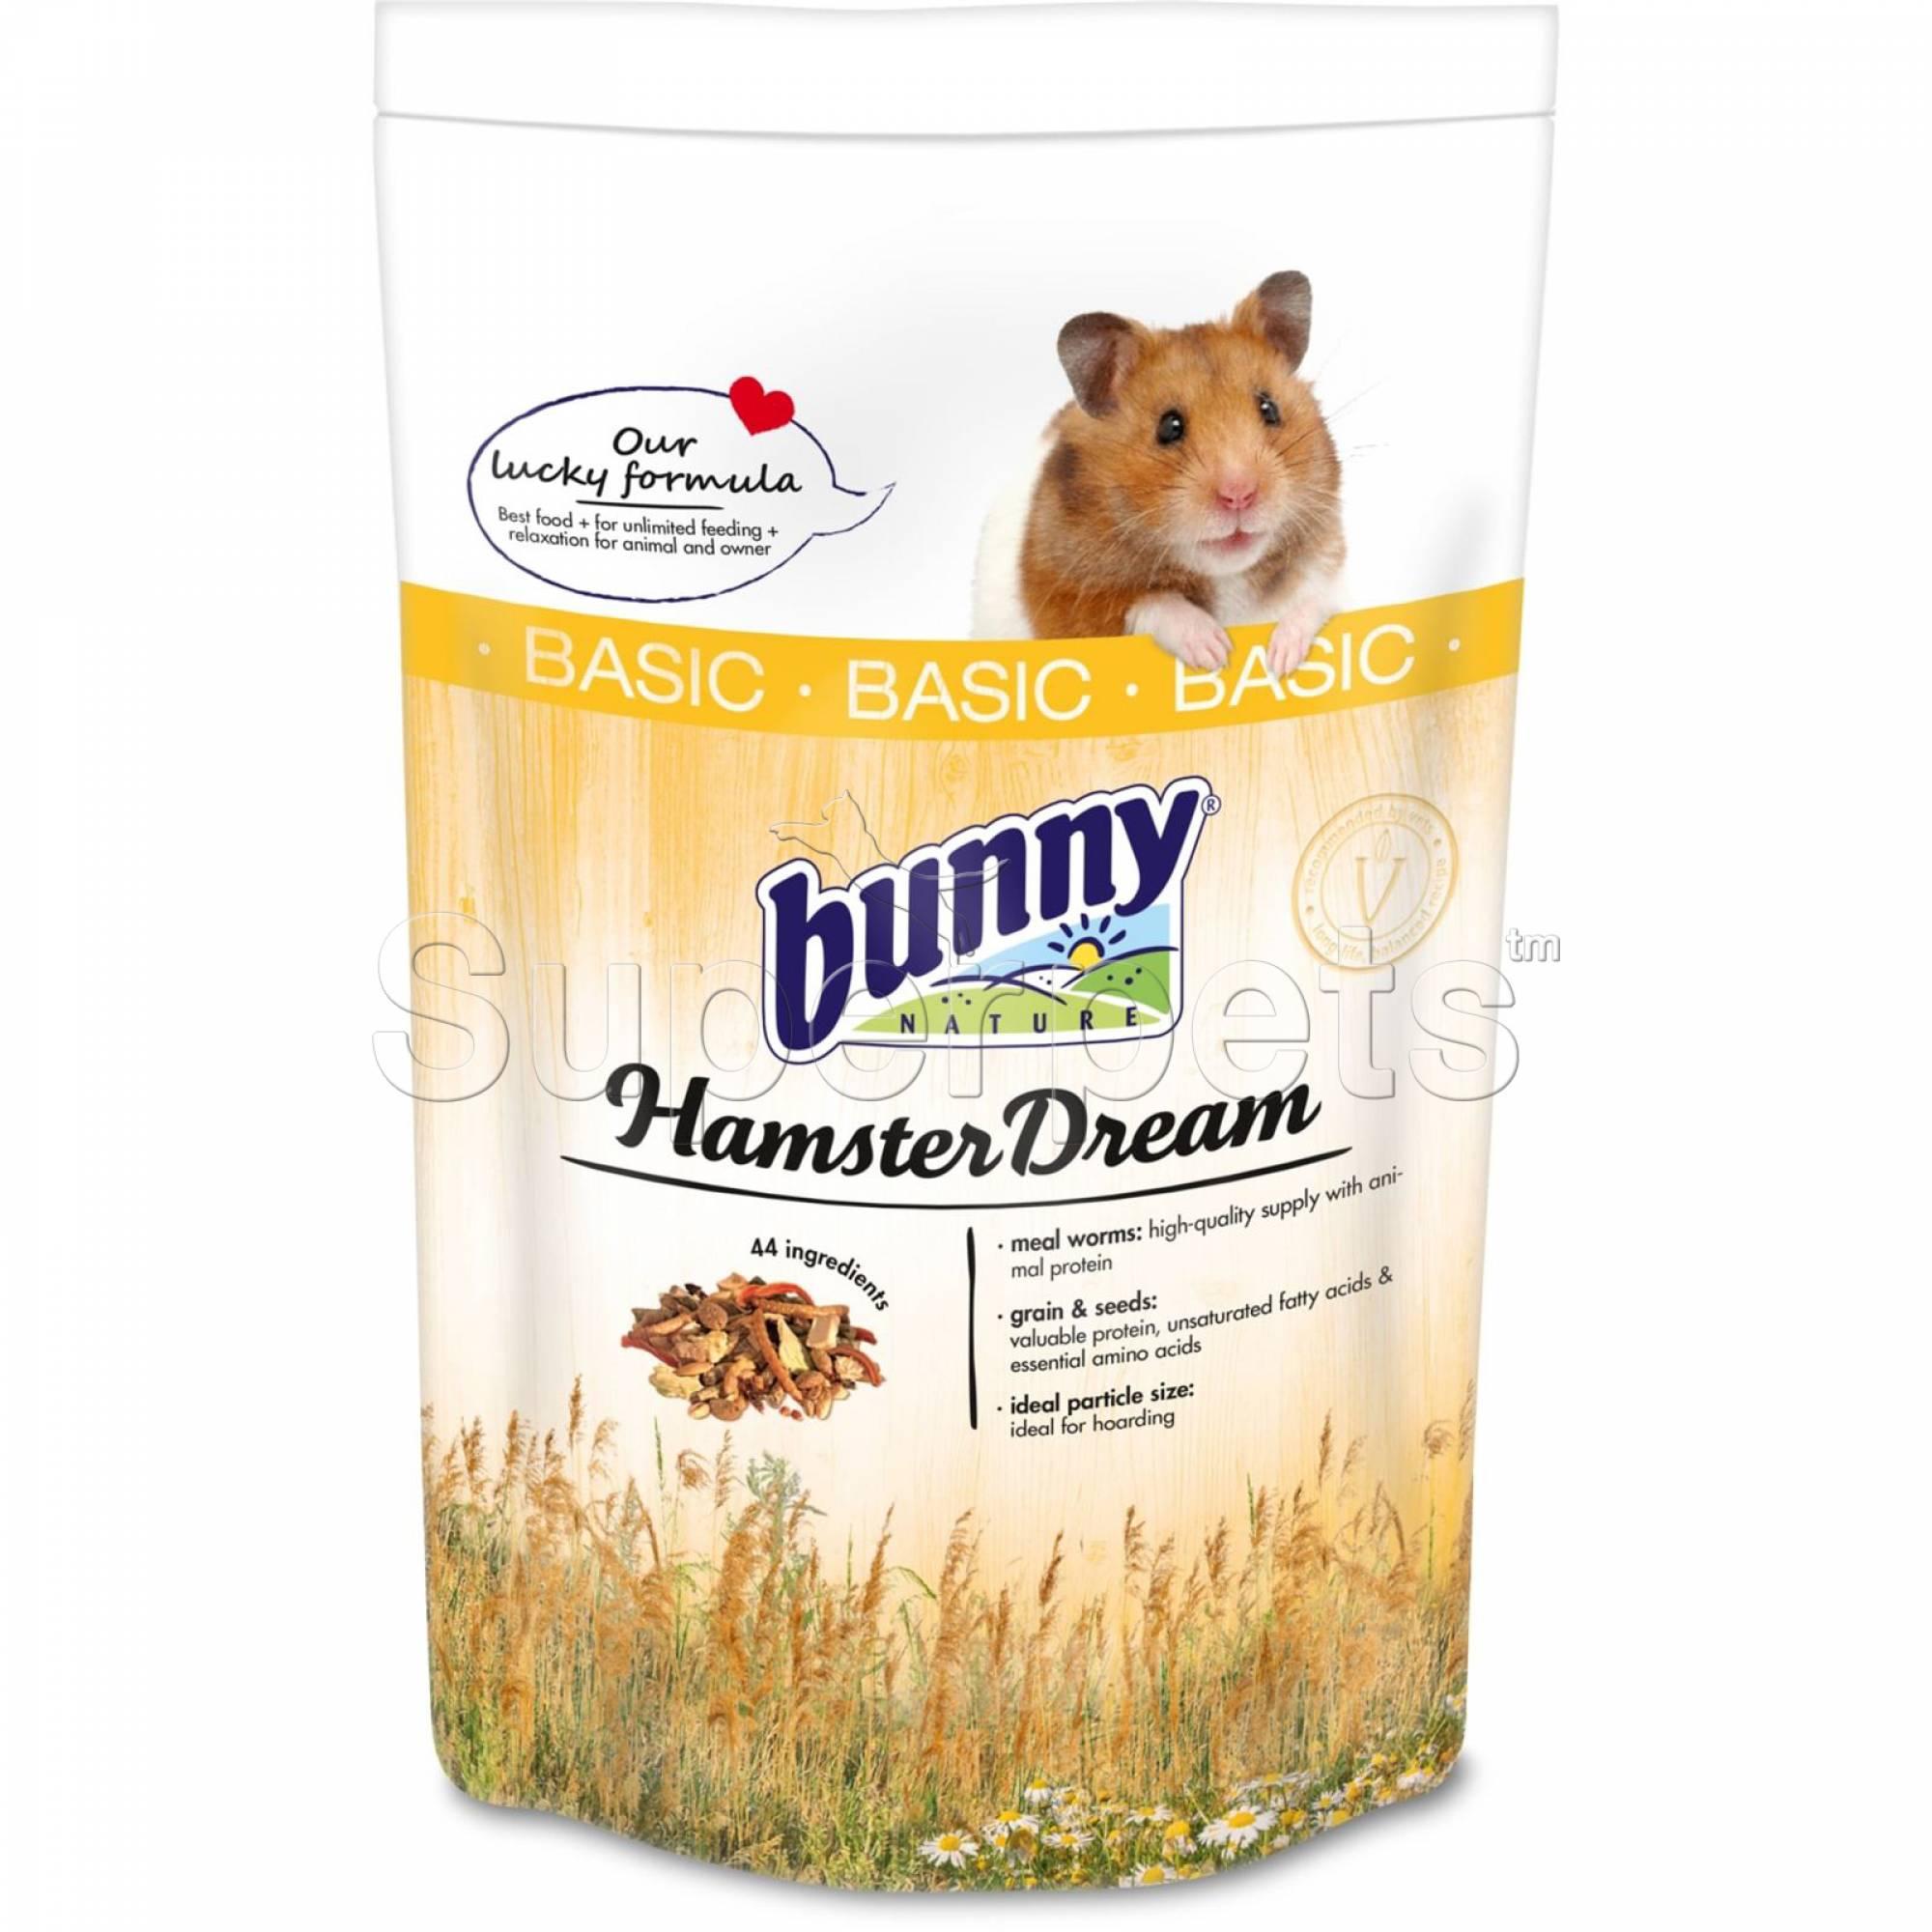 Bunny Nature Dwarf Hamster Dream Basic 600g (BN25921)